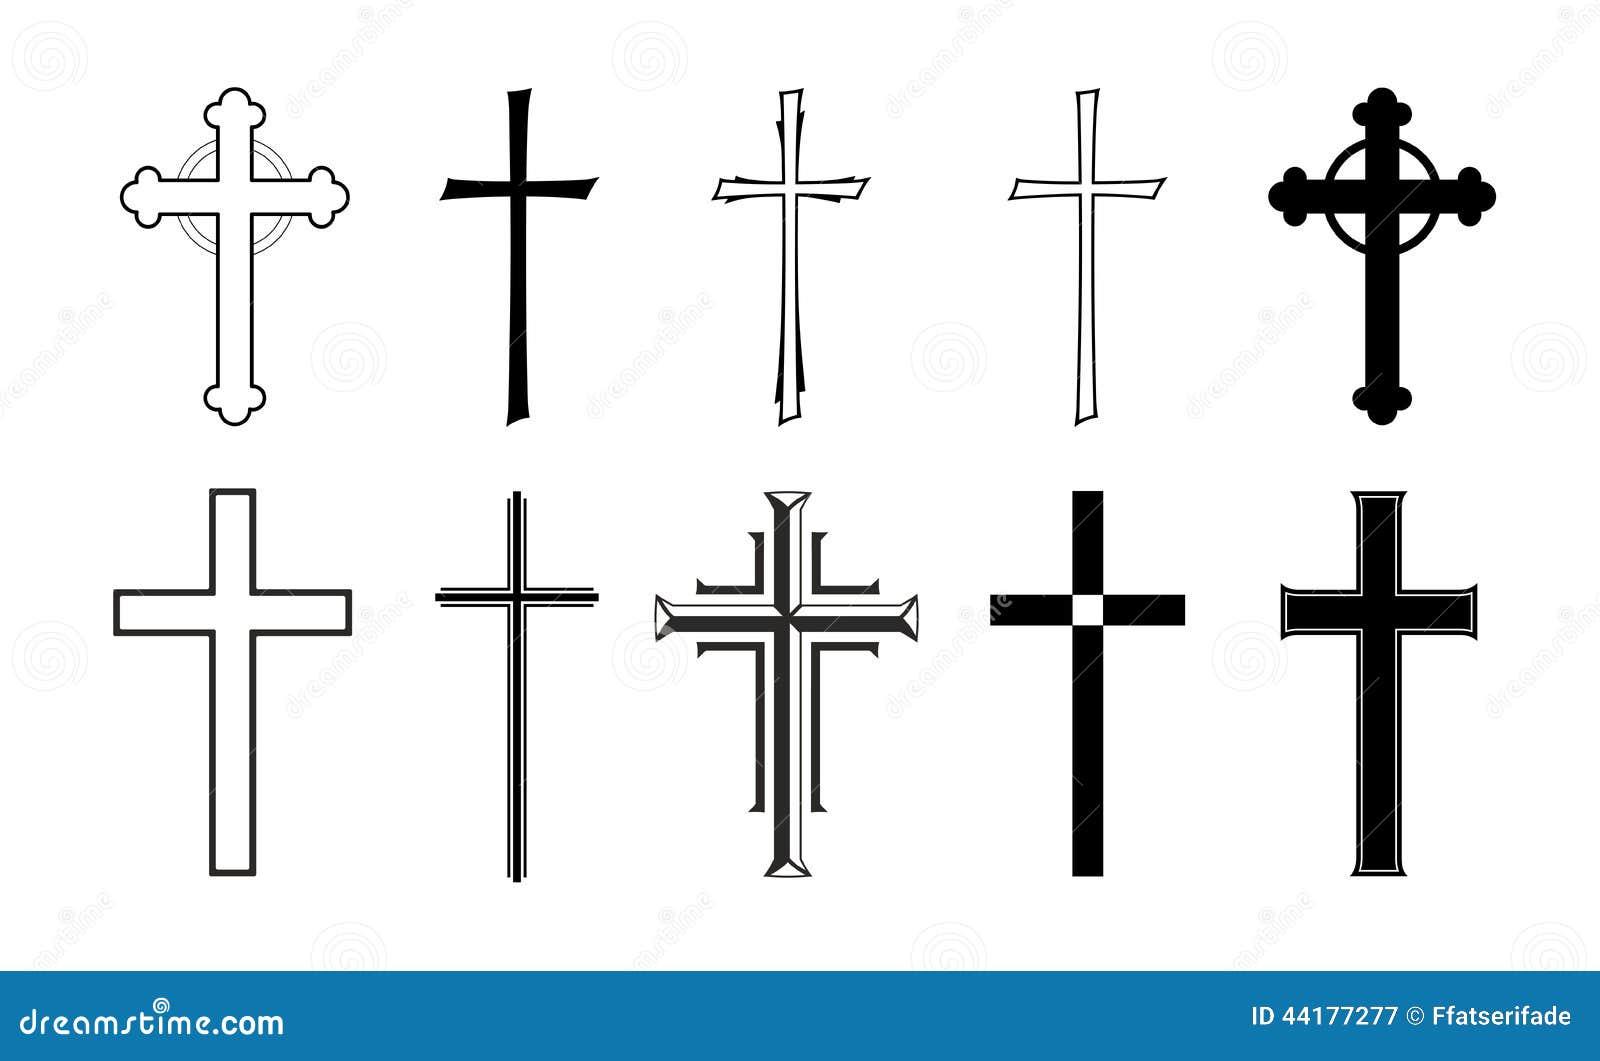 1810 Inspiring Cross And Rose moreover 586 100 Cibles De Tir 14x14 Cm Asg moreover Chylothorax also Advent Day 20 John The Baptist additionally 557 Trepied De Tir Gehmann. on crosses